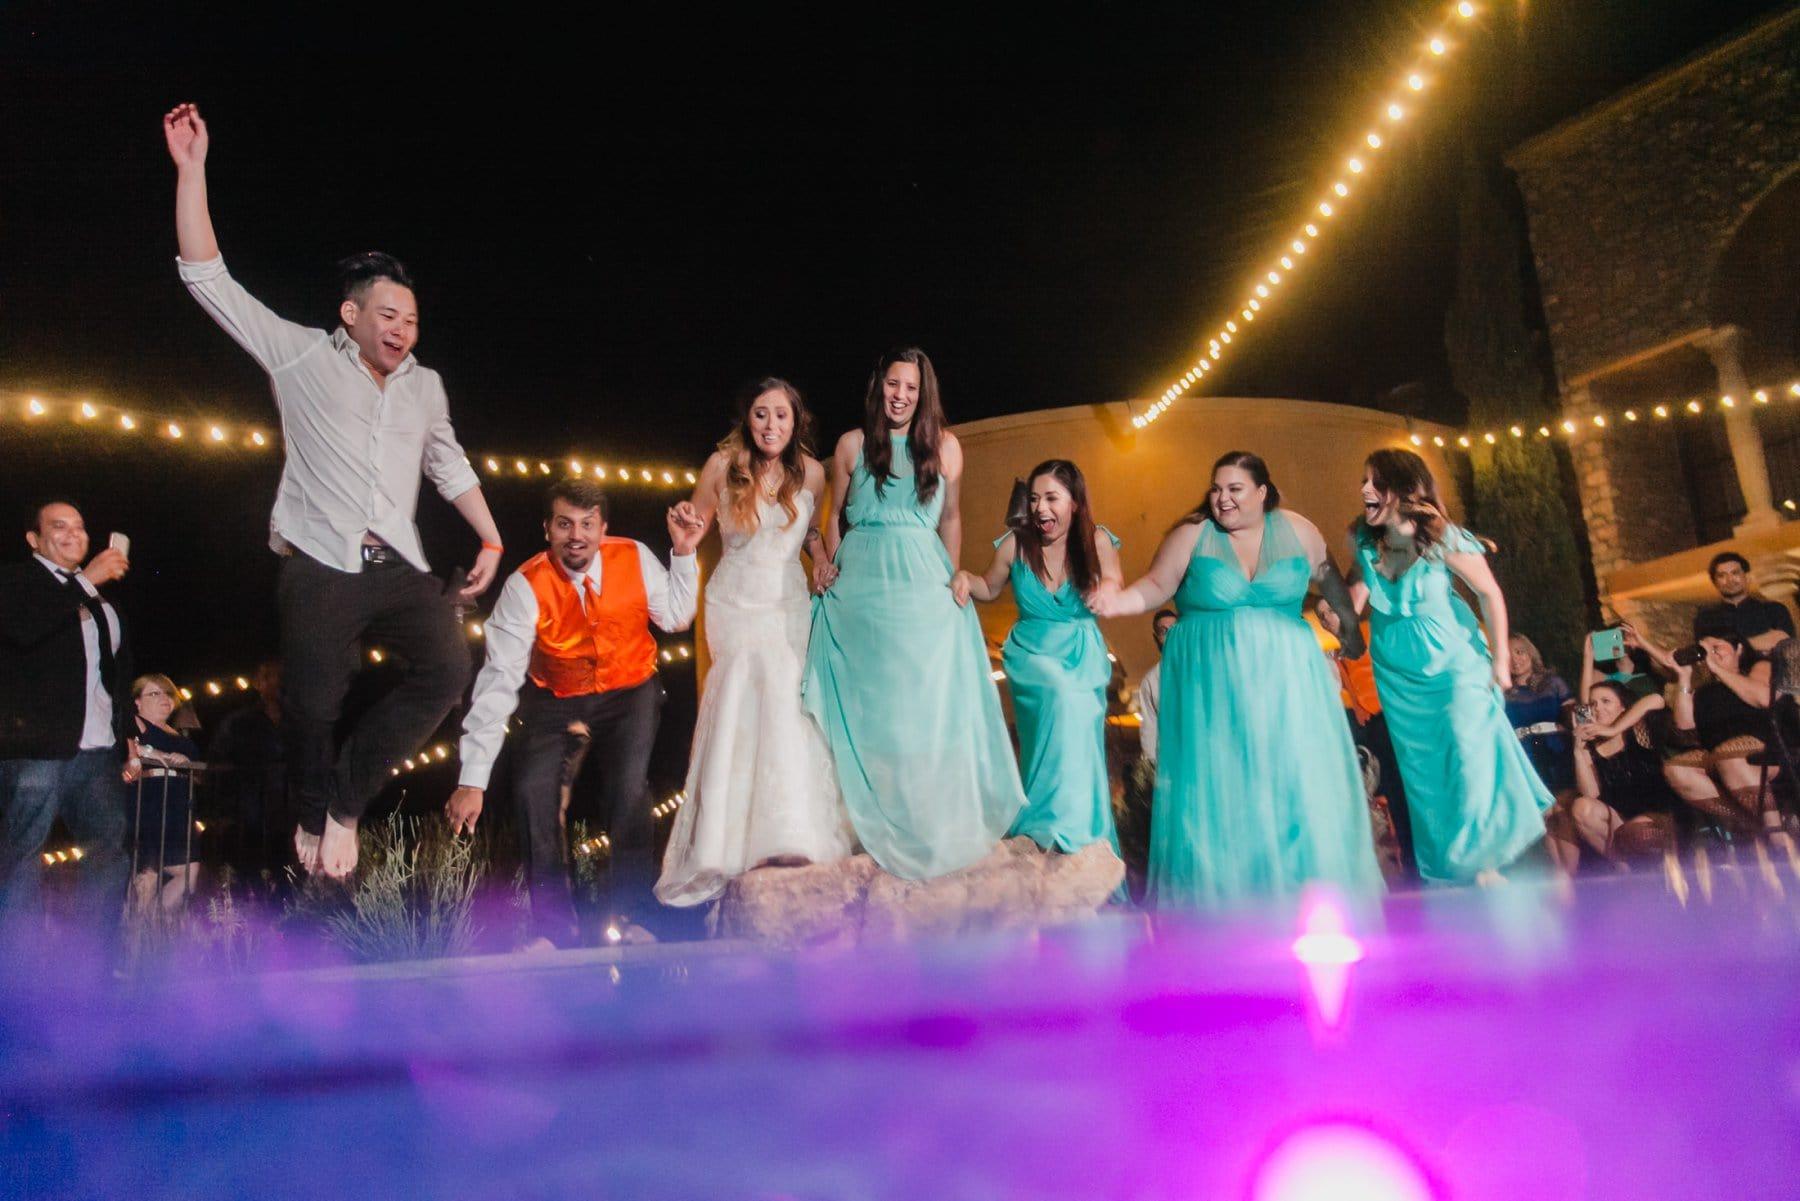 adventurous-candid-tempe-wedding-photographer_0029